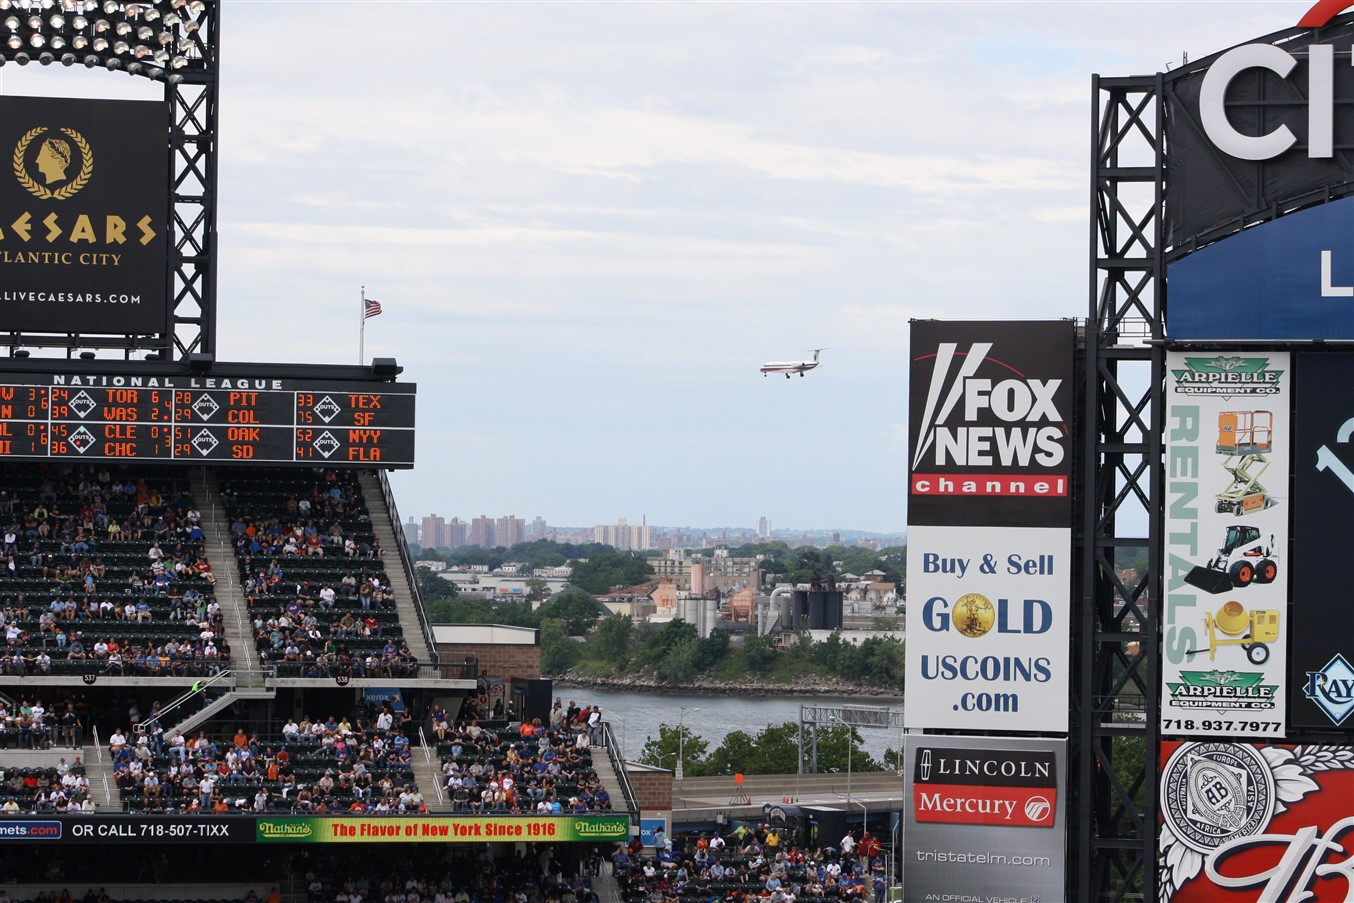 2009 06 21 Law School Road Trip Day 6 New York Mets 128.jpg